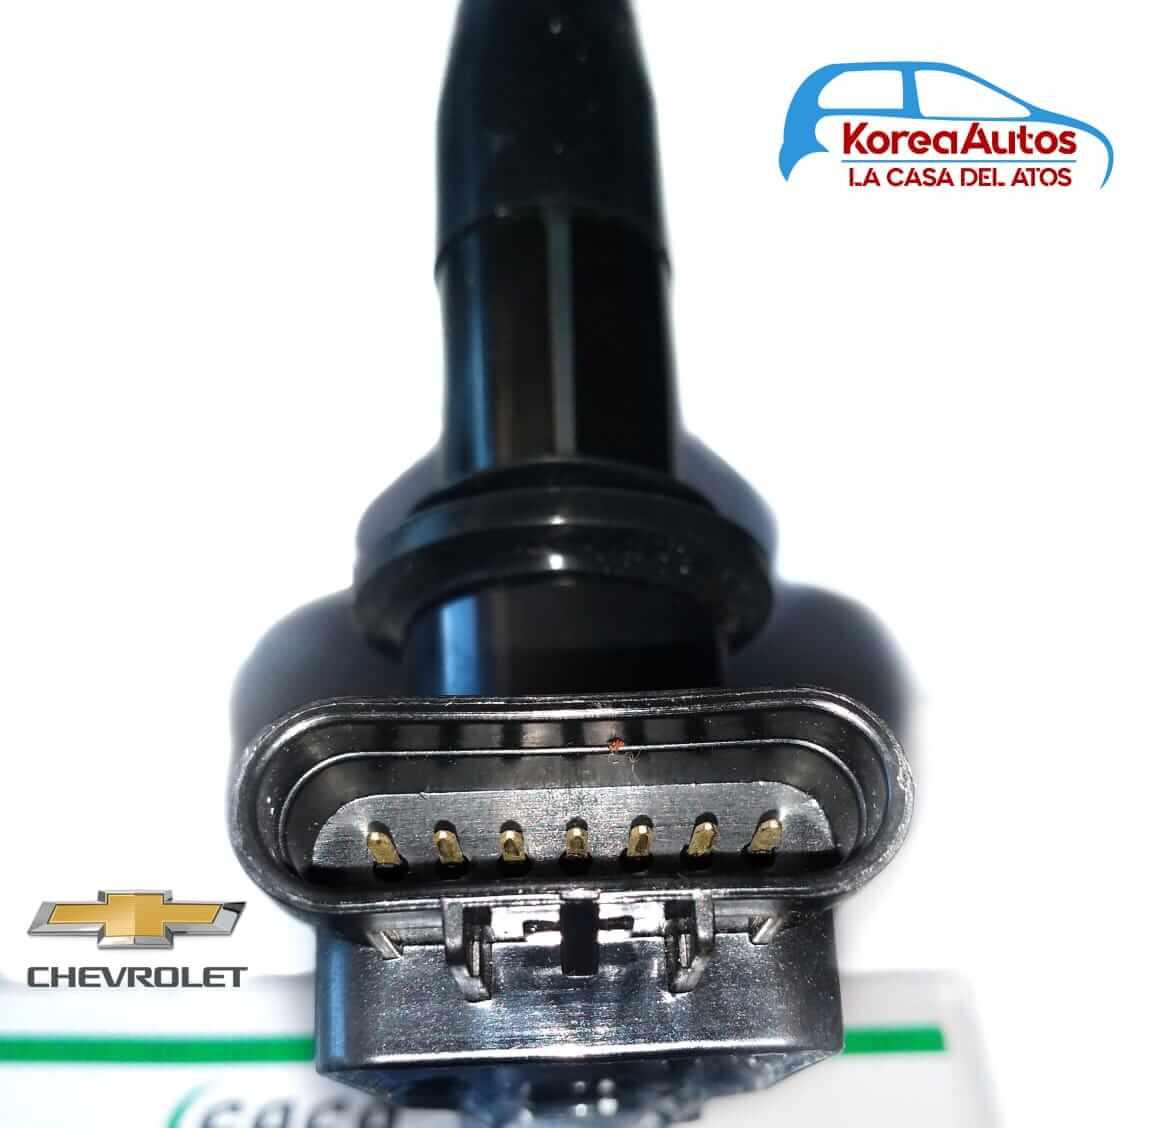 Bobina de Encendido para Chevrolet Cruze Sonic y Tracker